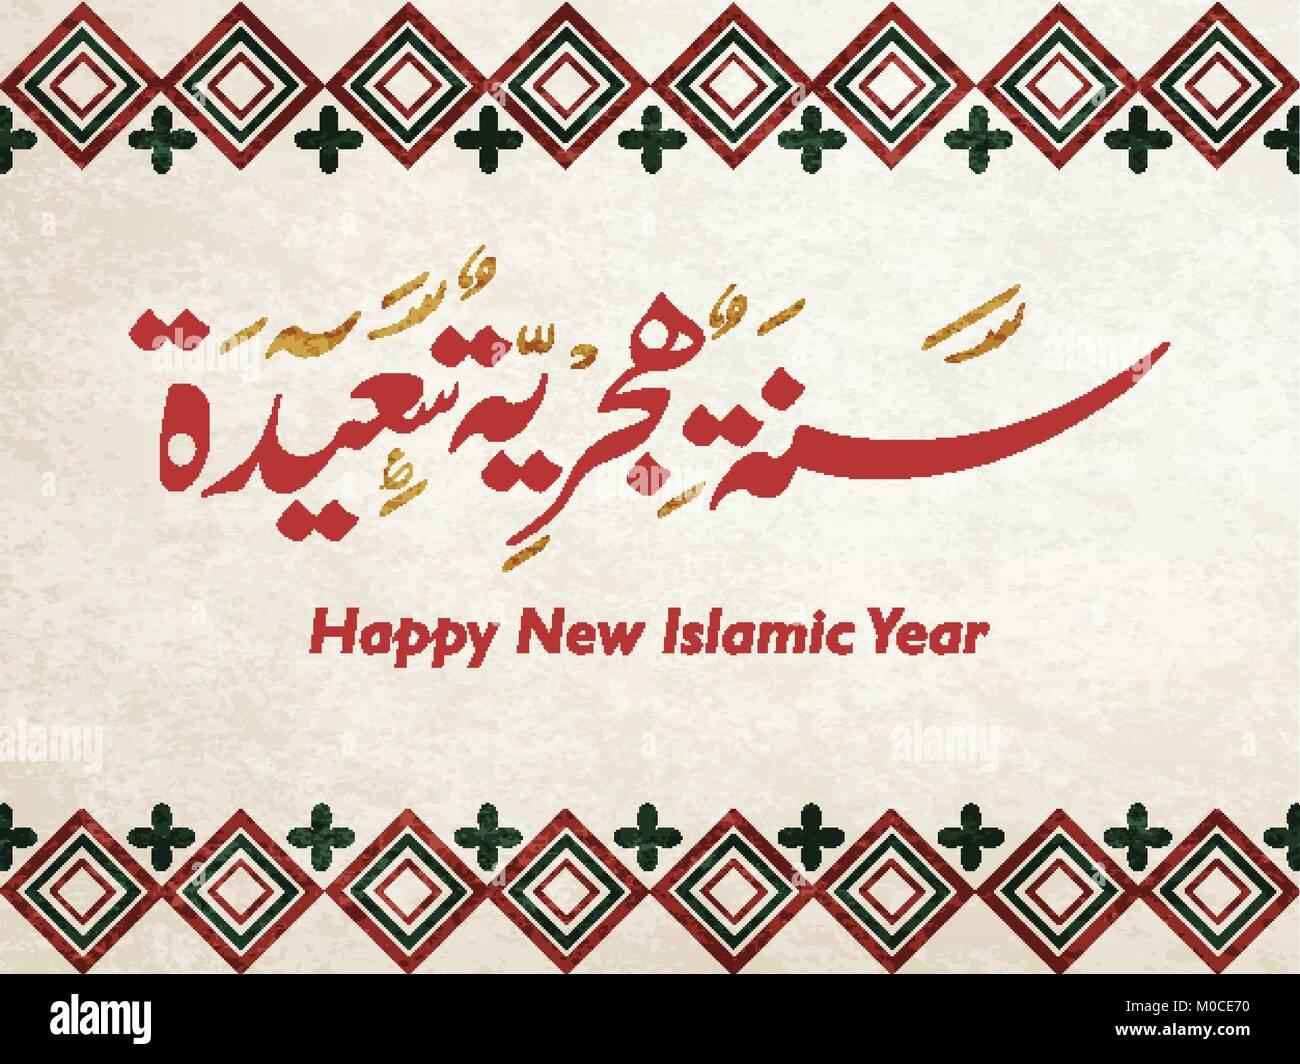 Happy New Islamic Year Blessed Hijri New Year In Arabic Calligraphy